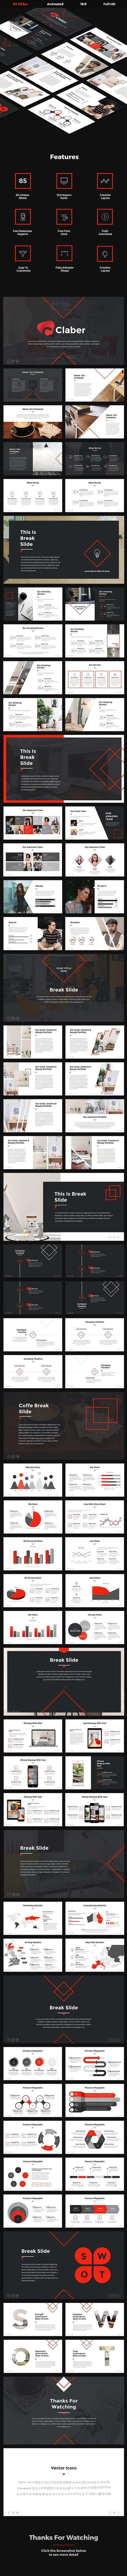 Claber - Creative Keynote Template - 85 Unique Creative Slides